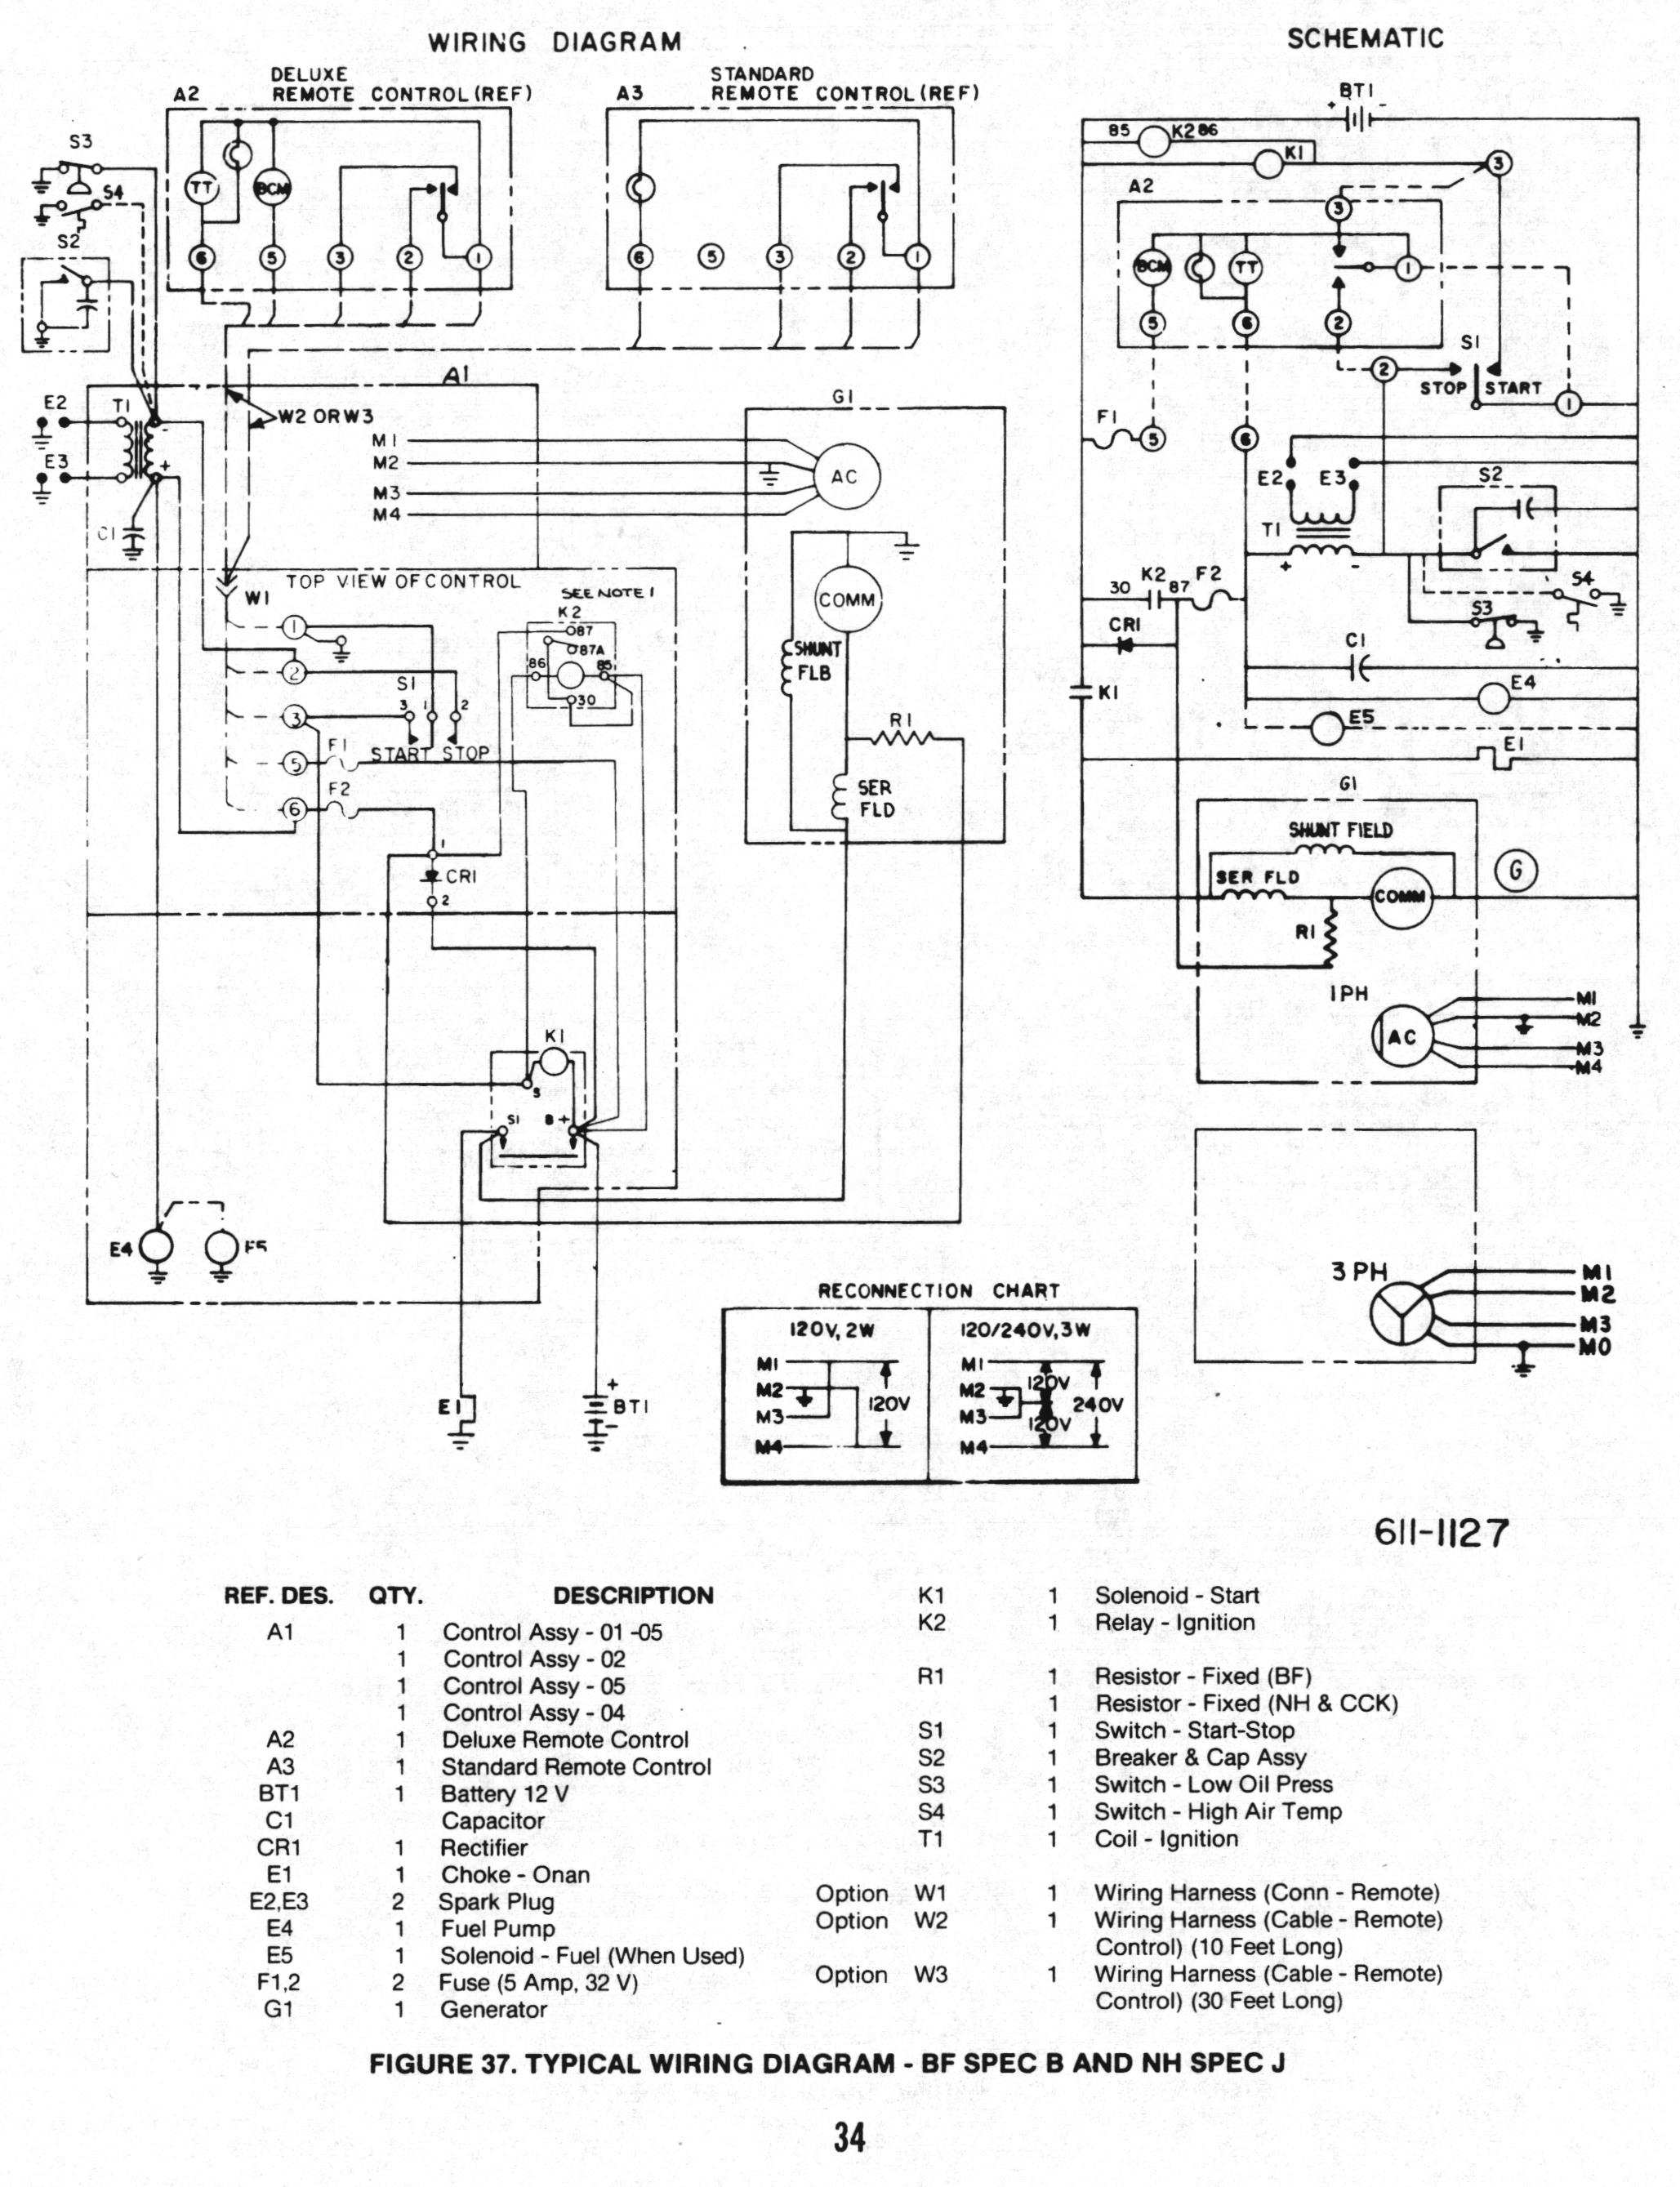 onan generator 4500 wiring diagram for bgd